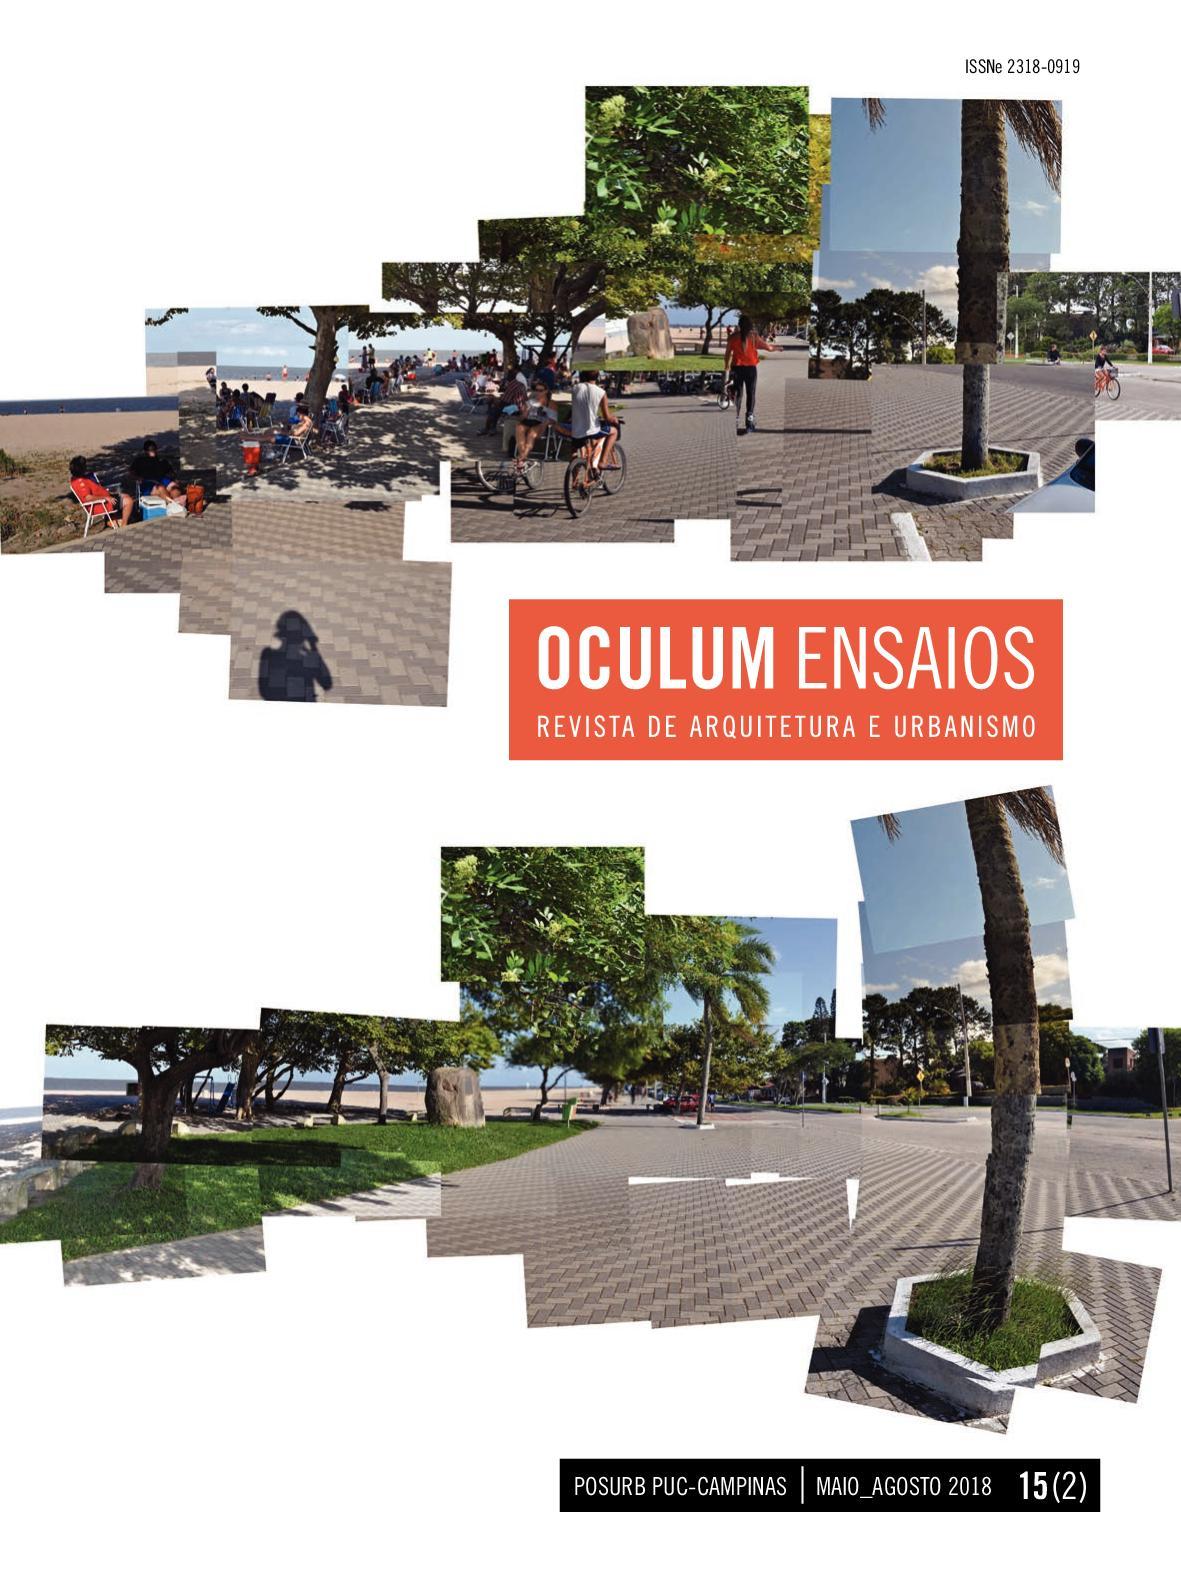 952cc23e6186b Calaméo - Oculum N15(2)